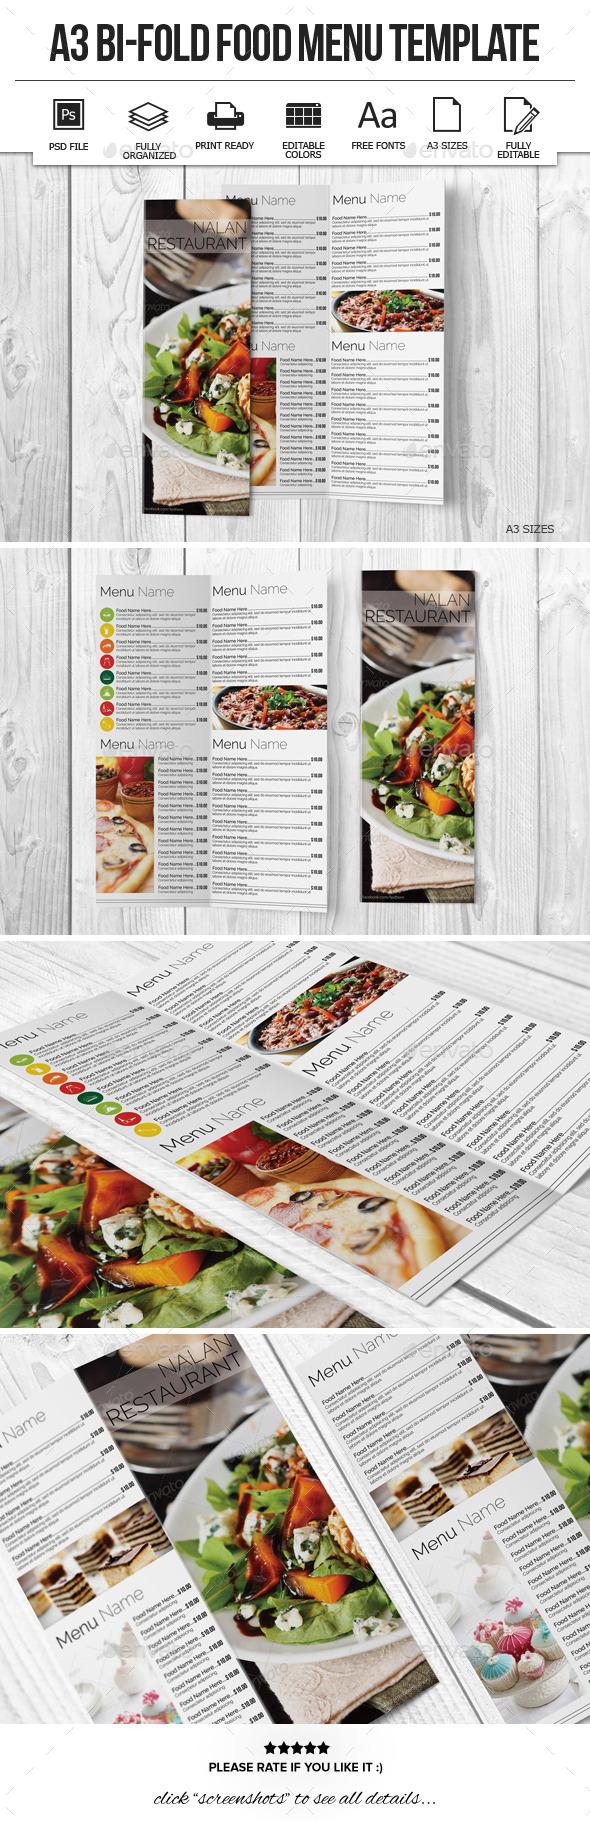 GraphicRiver A3 Bi-Fold Food Menu Template 10922552